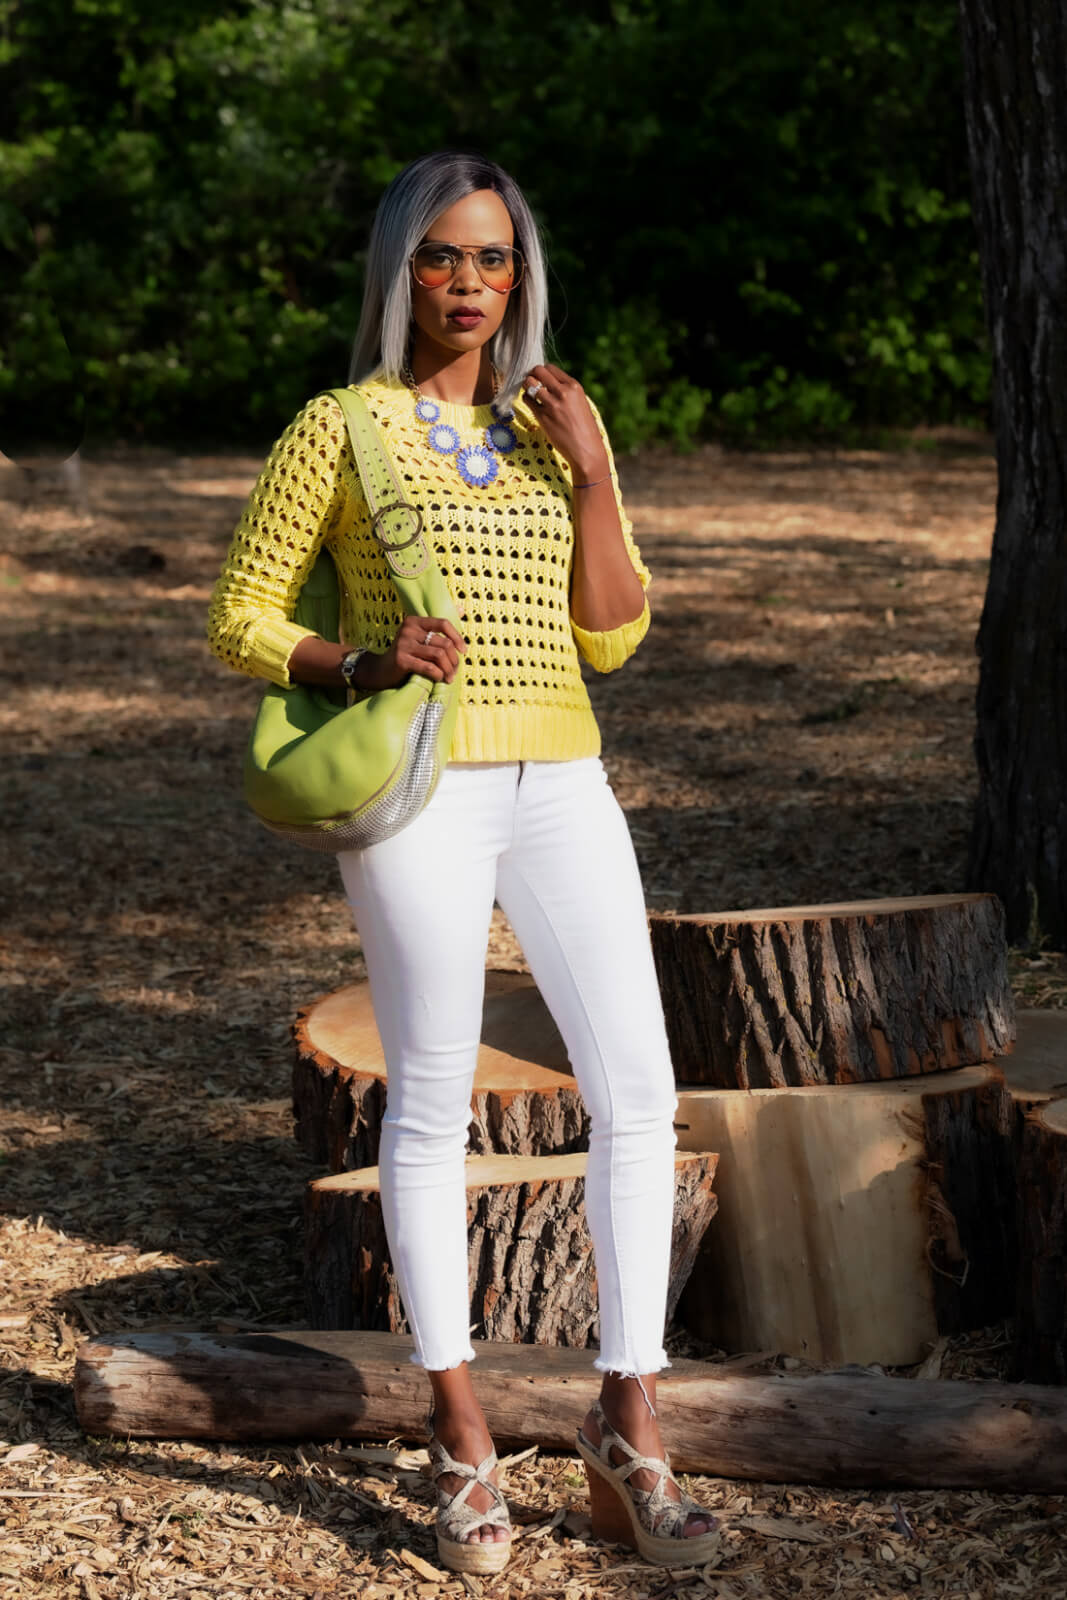 Sweater Weather, Summer Knit Sweaters, Winnipeg Fashion Blogger, What to wear, Summer Fashion, Women's Clothing